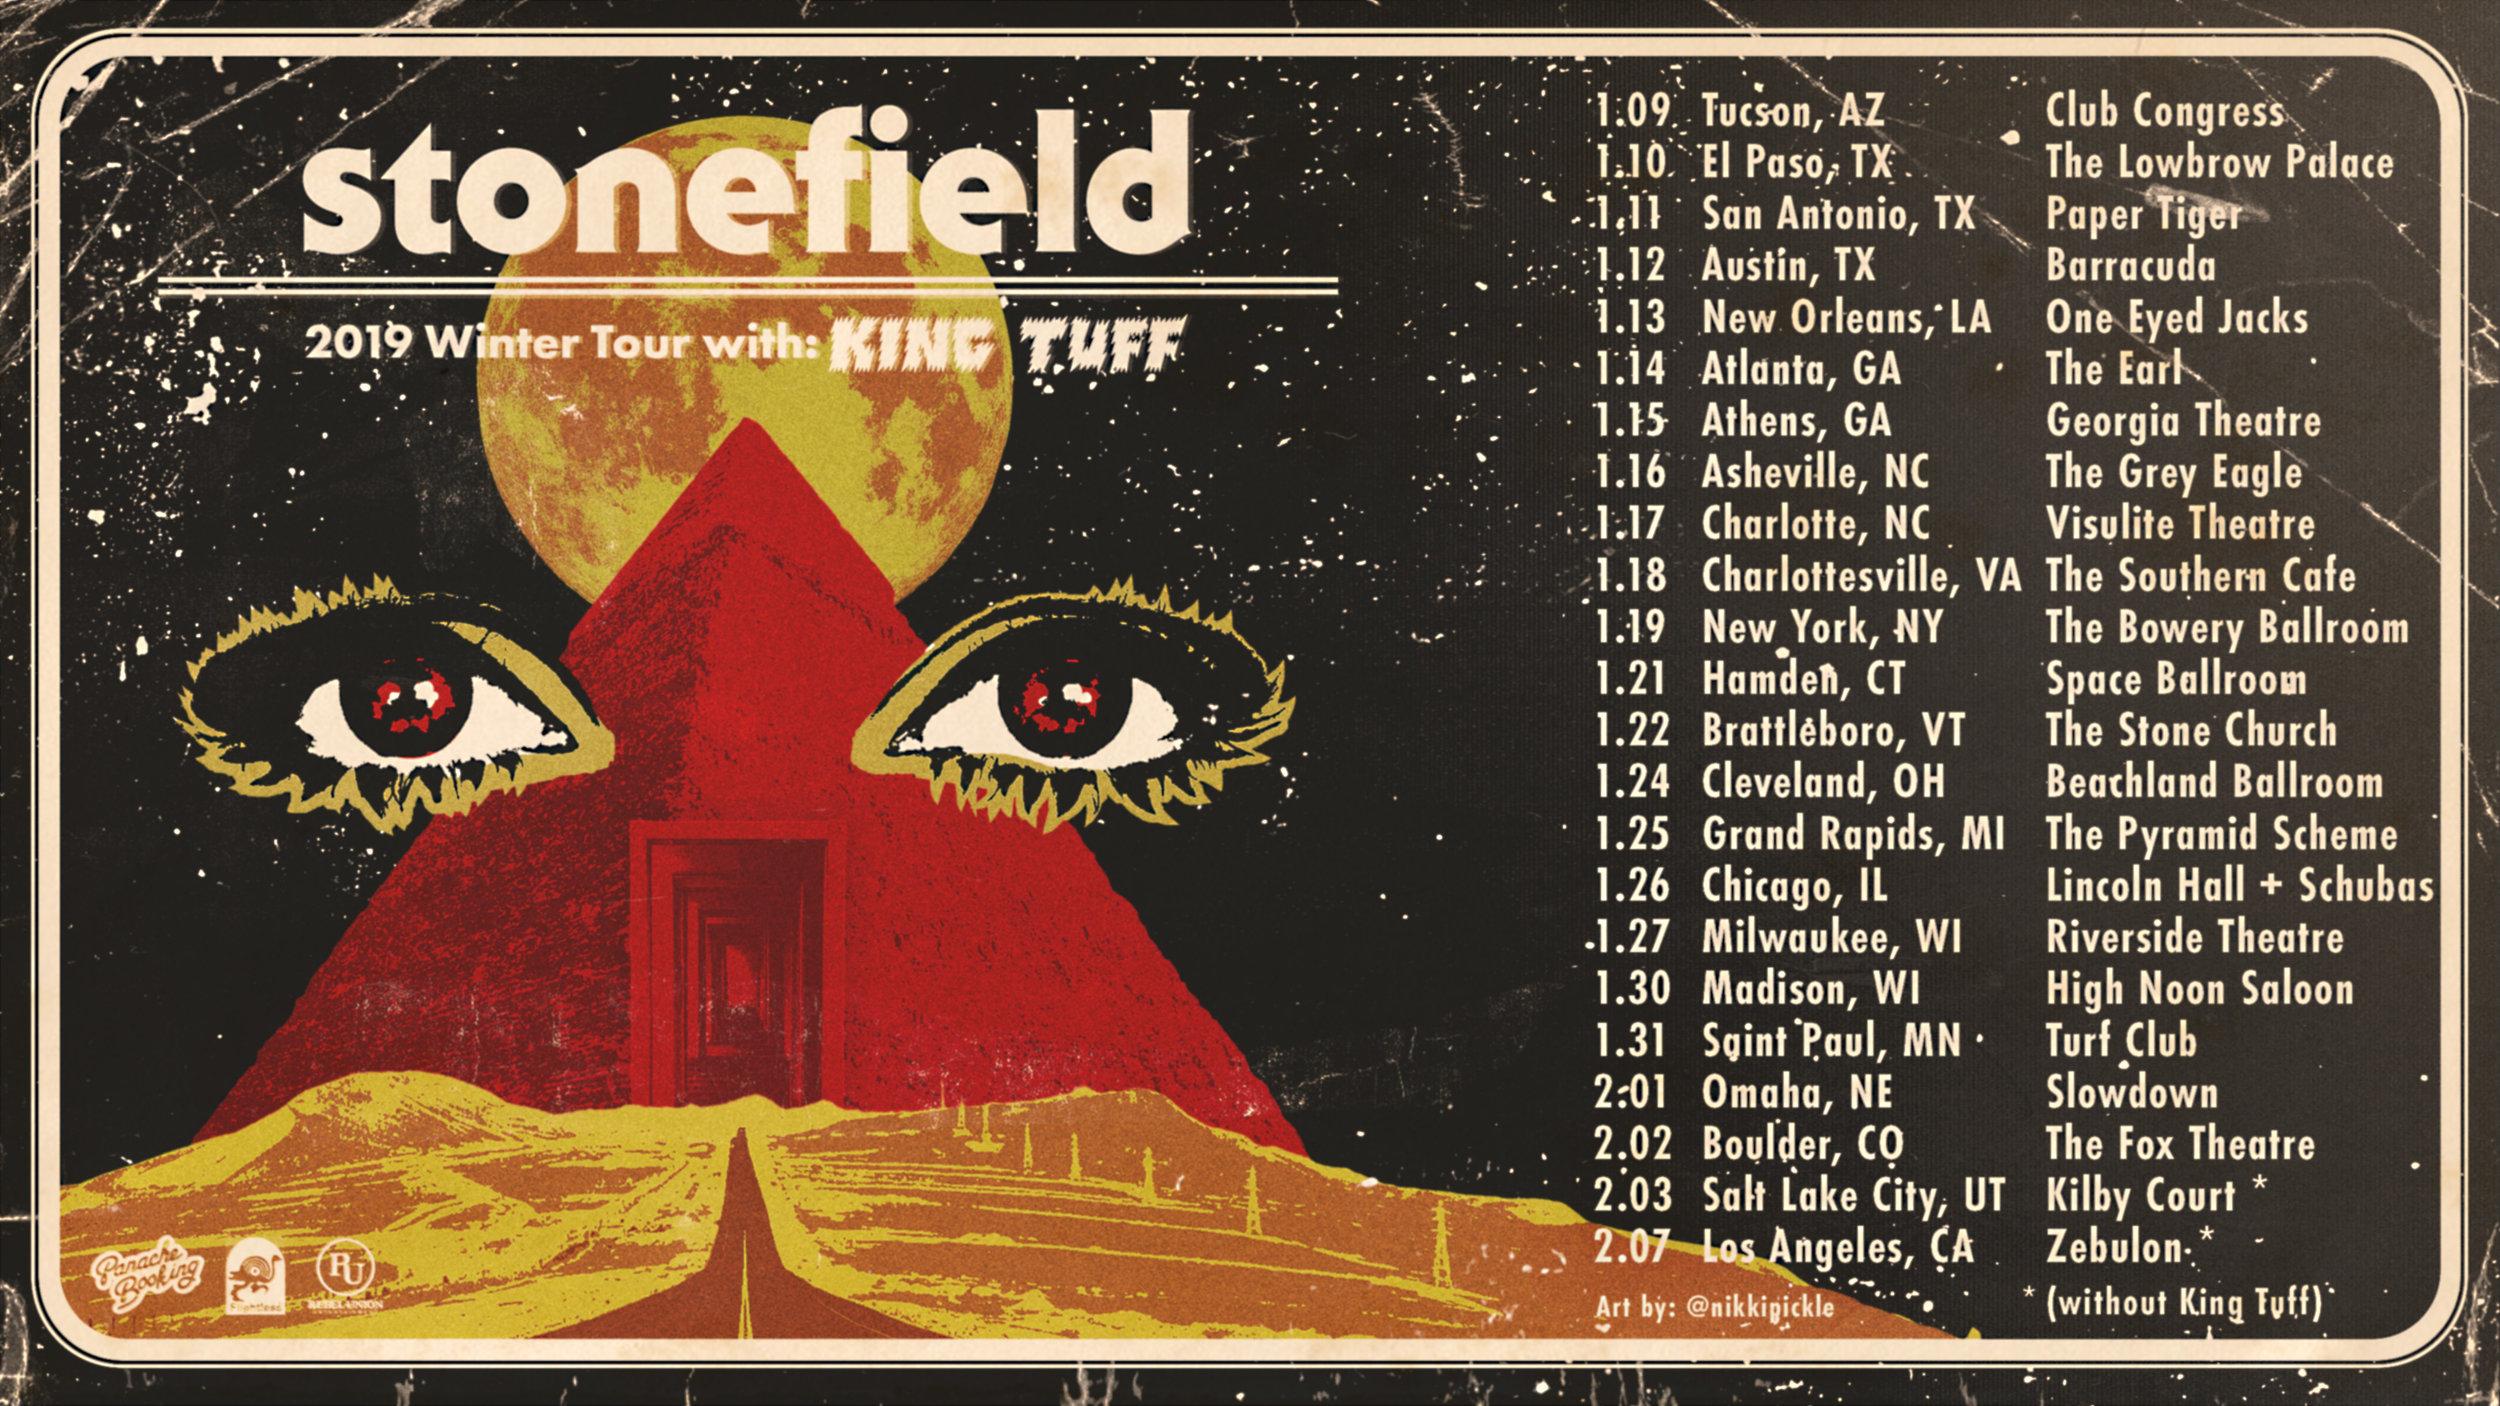 stonefield-king-tuff-facebook.jpg